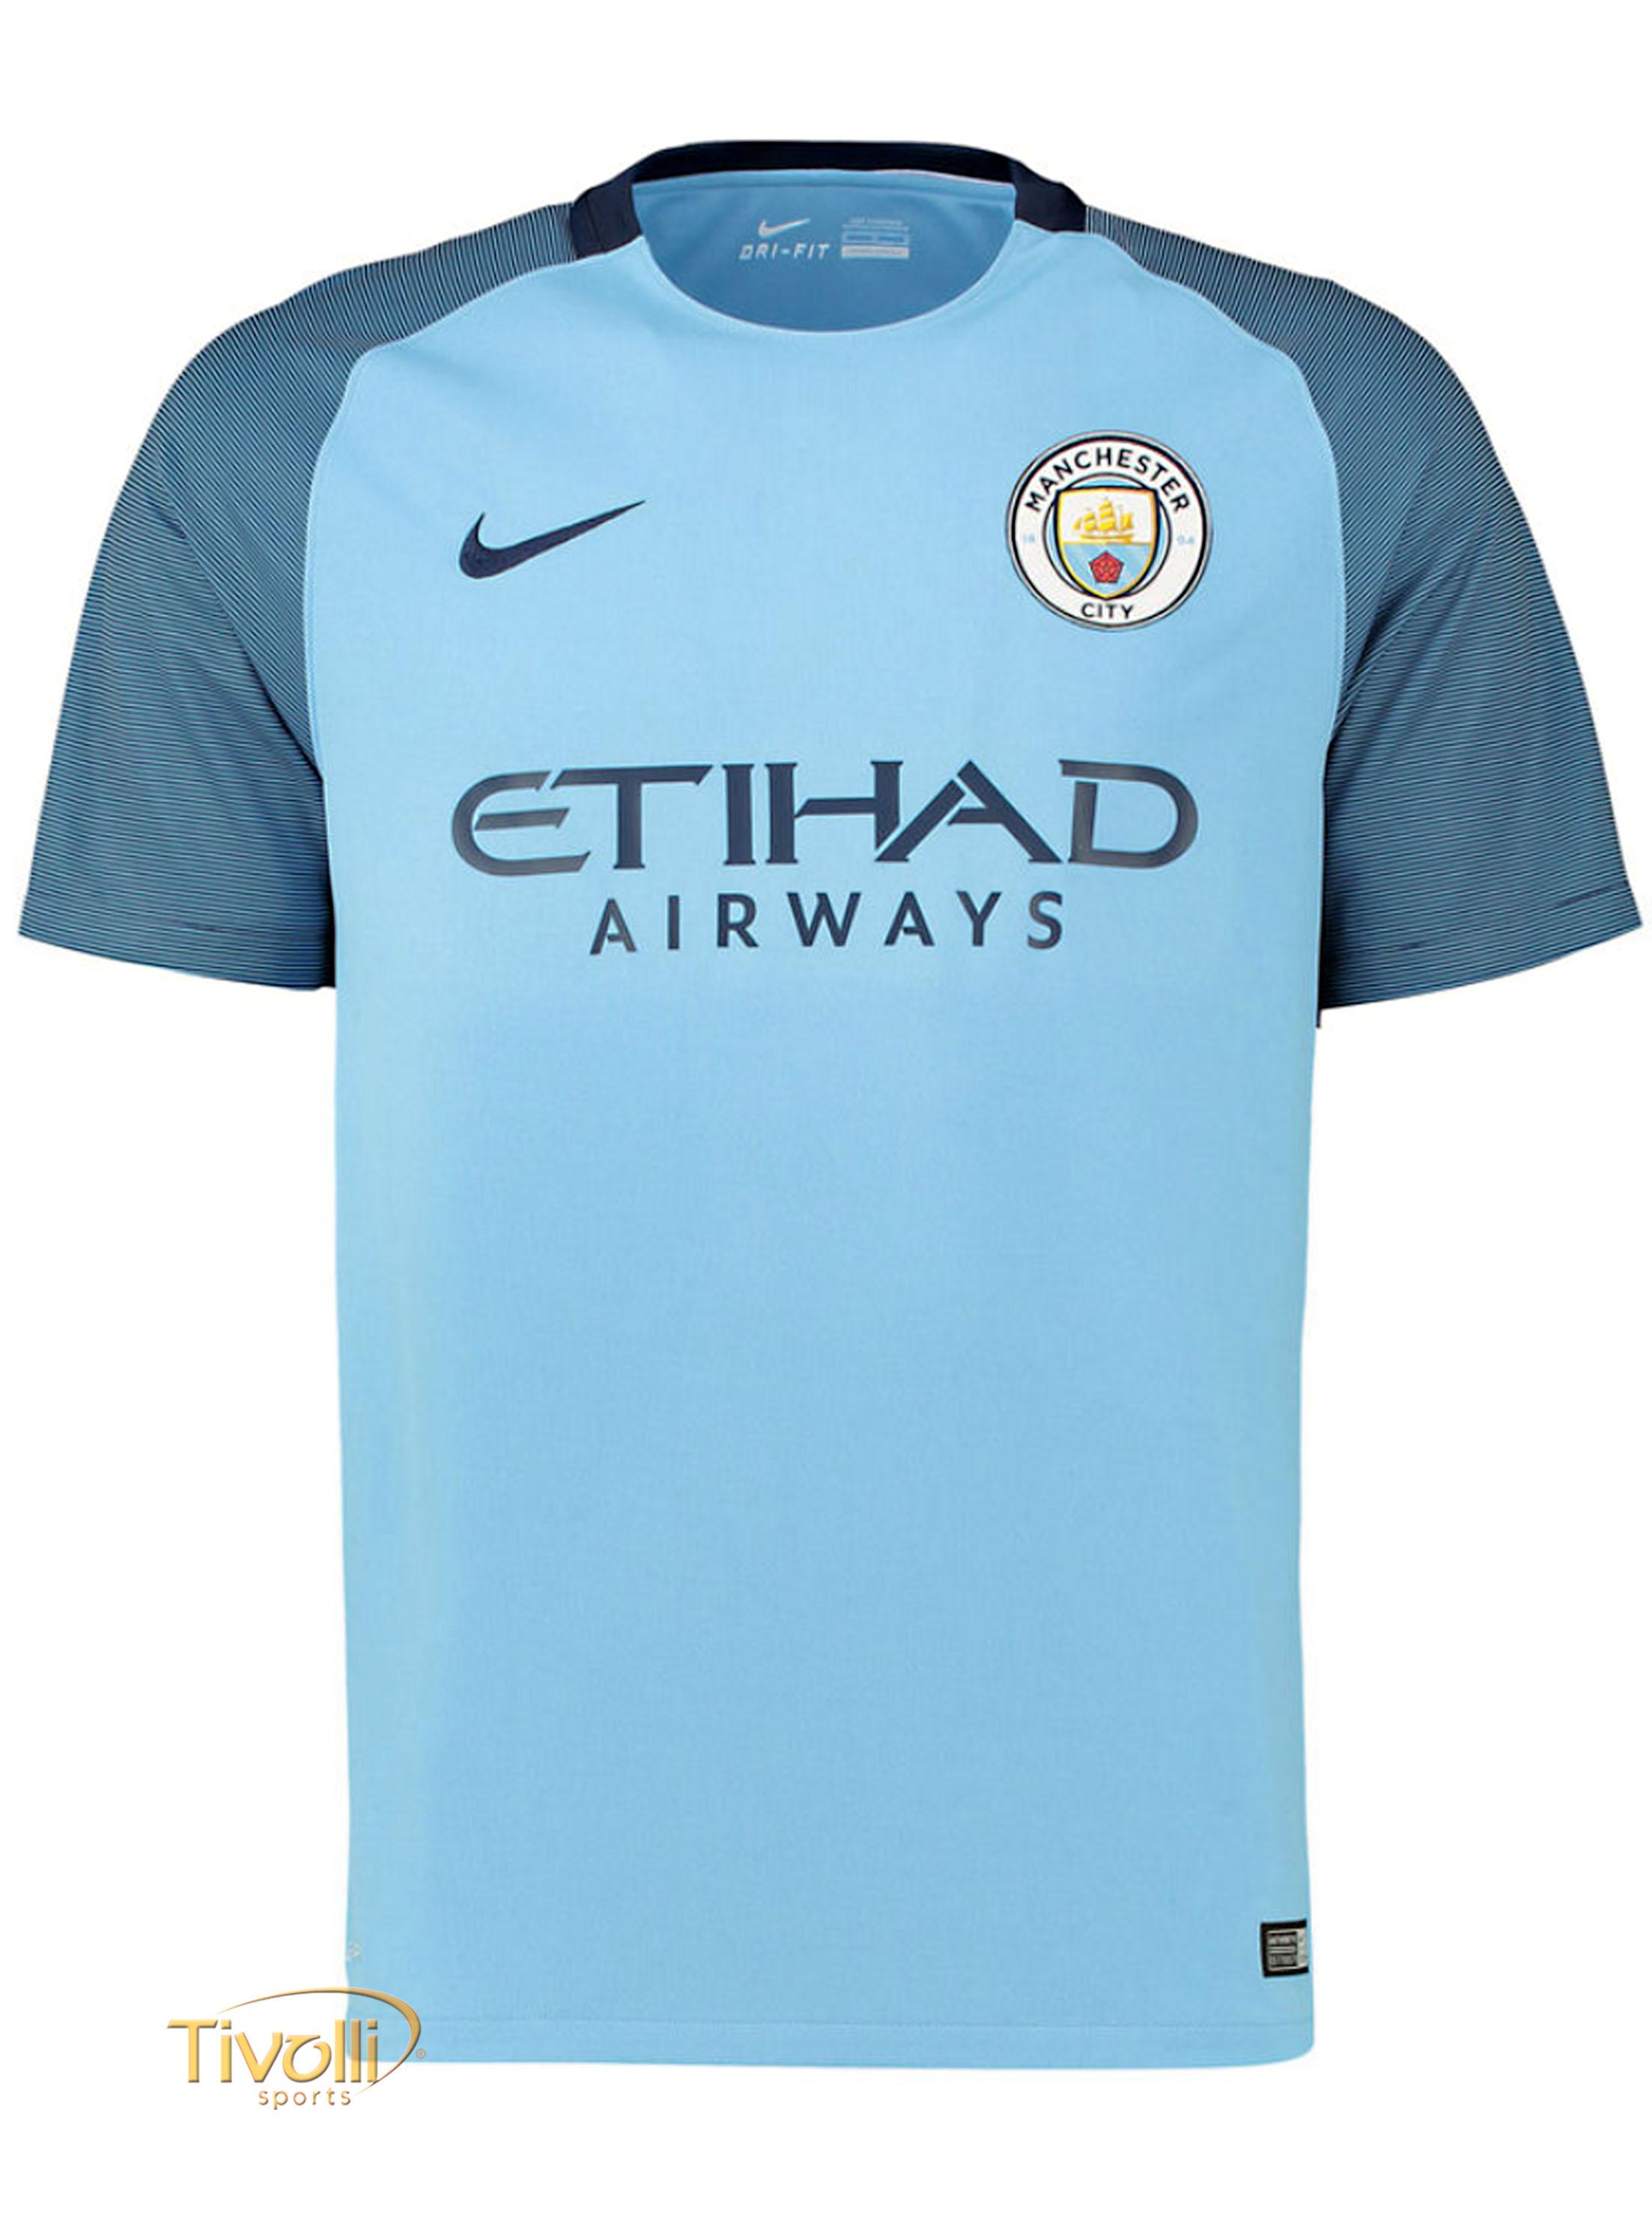 Camisa Manchester City I Home Infantil 2016 2017   - Mega Saldão   fc22b3642499b